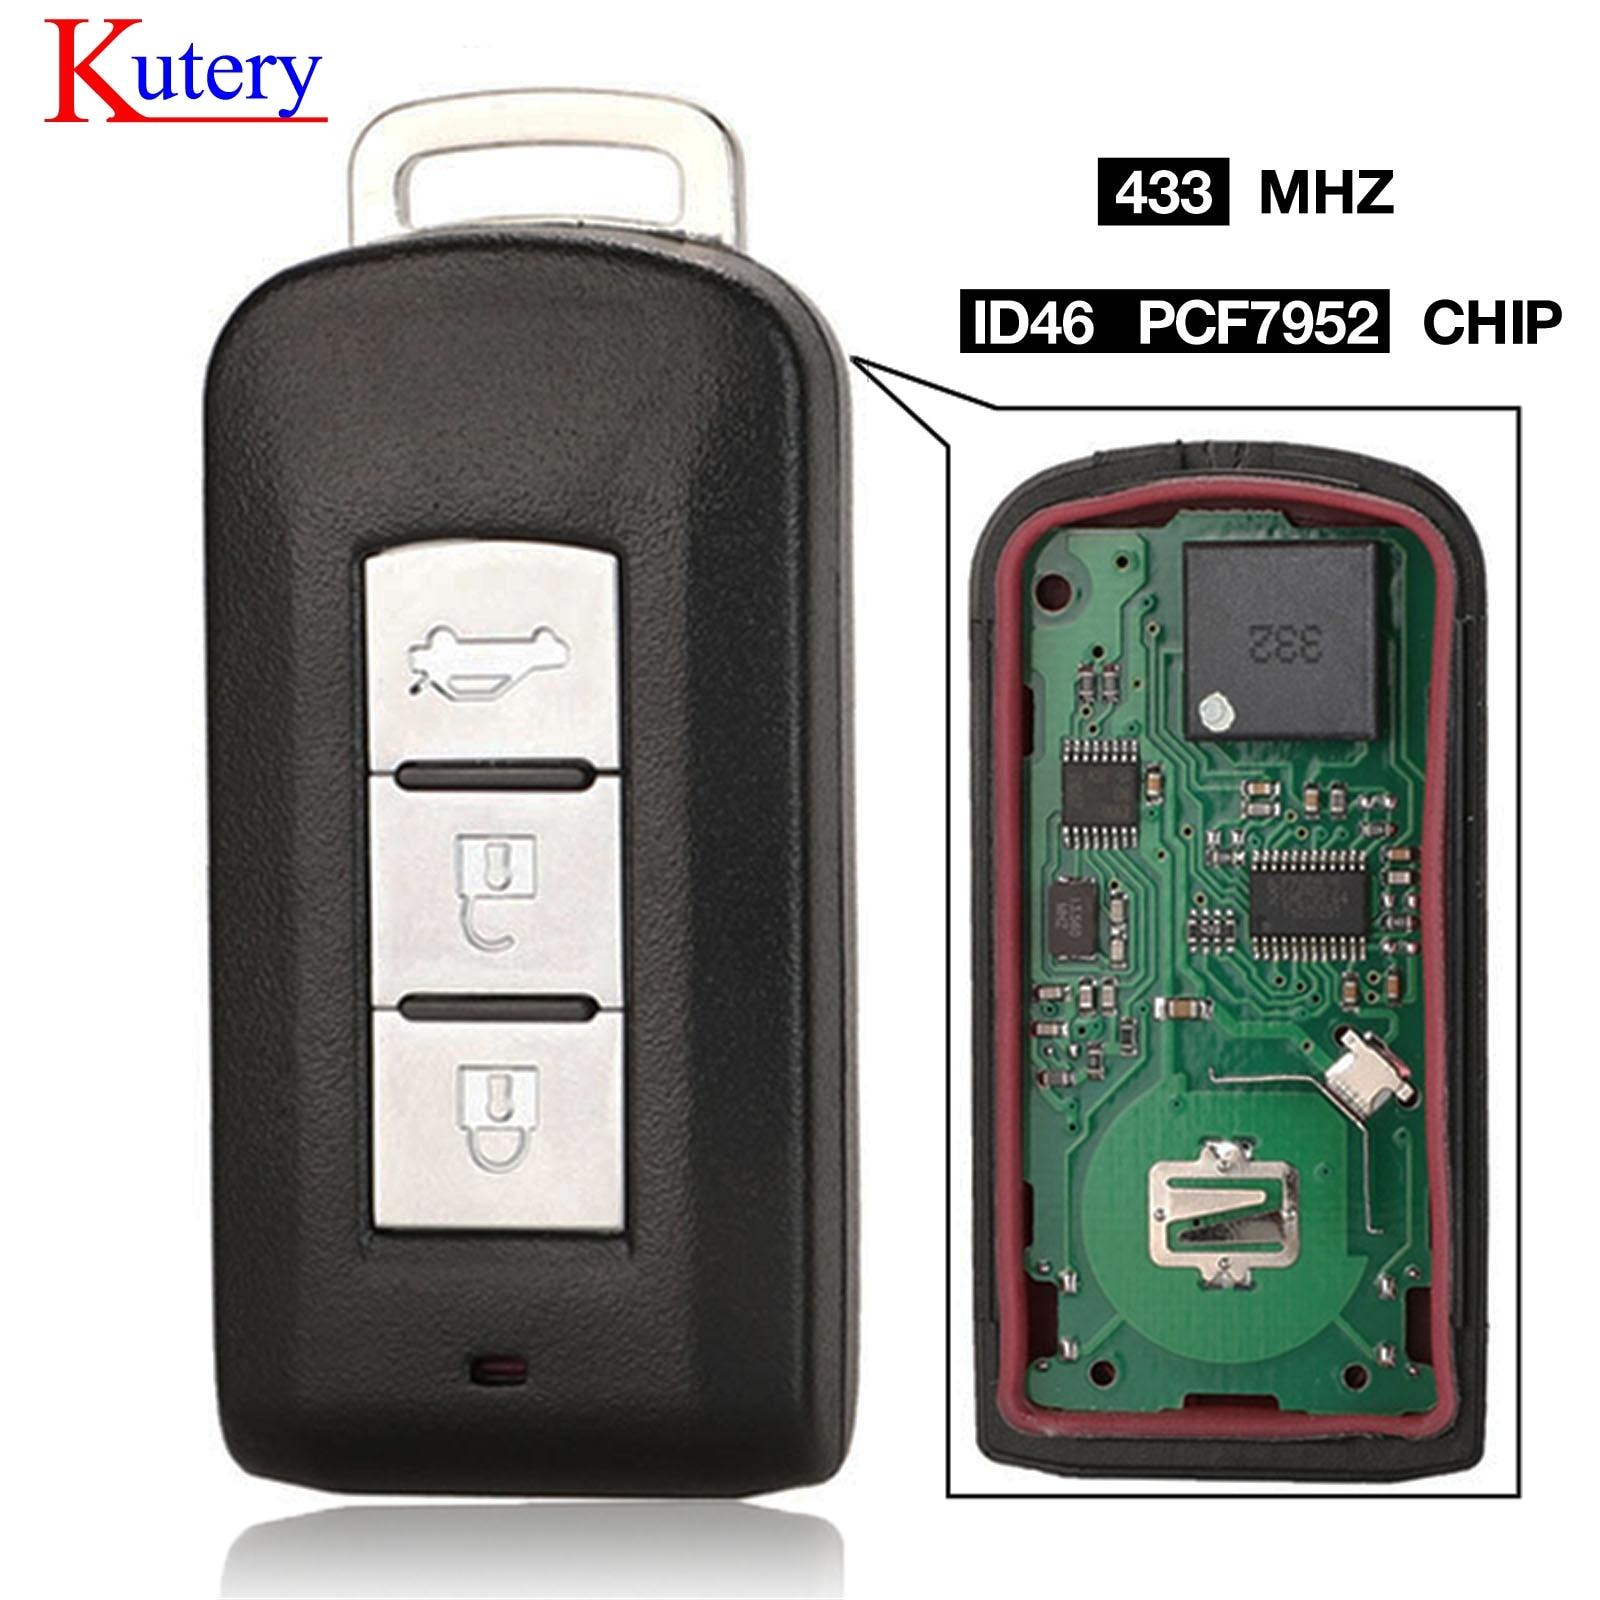 Kutery 3 botones remoto inteligente clave Fob FSK, 433MHz PCF7952 Chip para Mitsubishi Lancer Outlander ASX